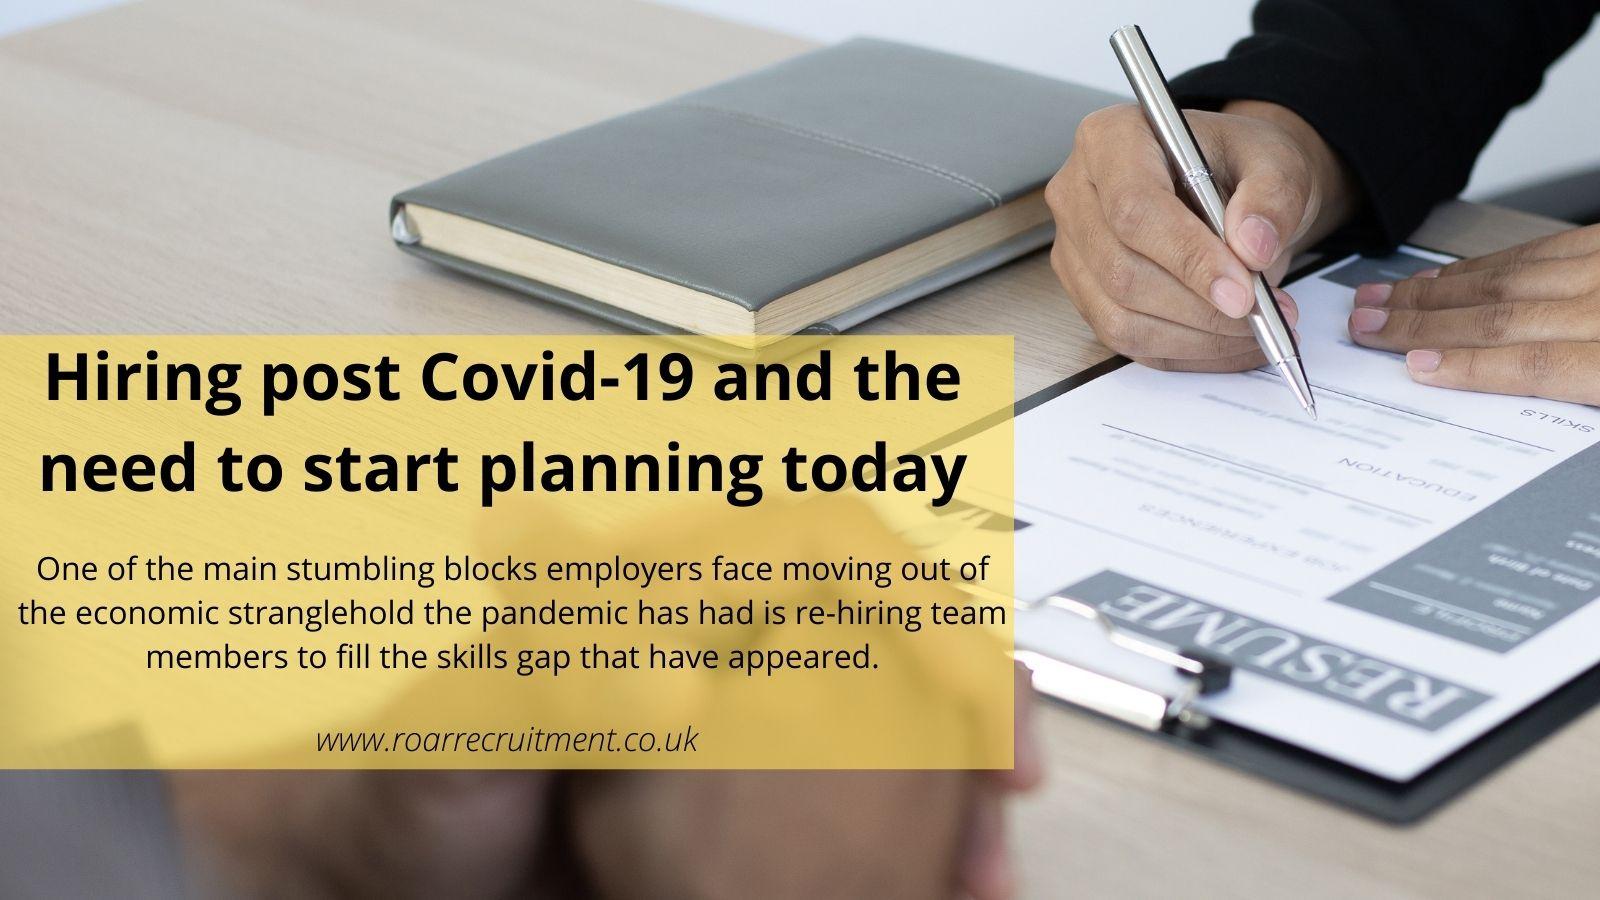 Hiring post Covid-19